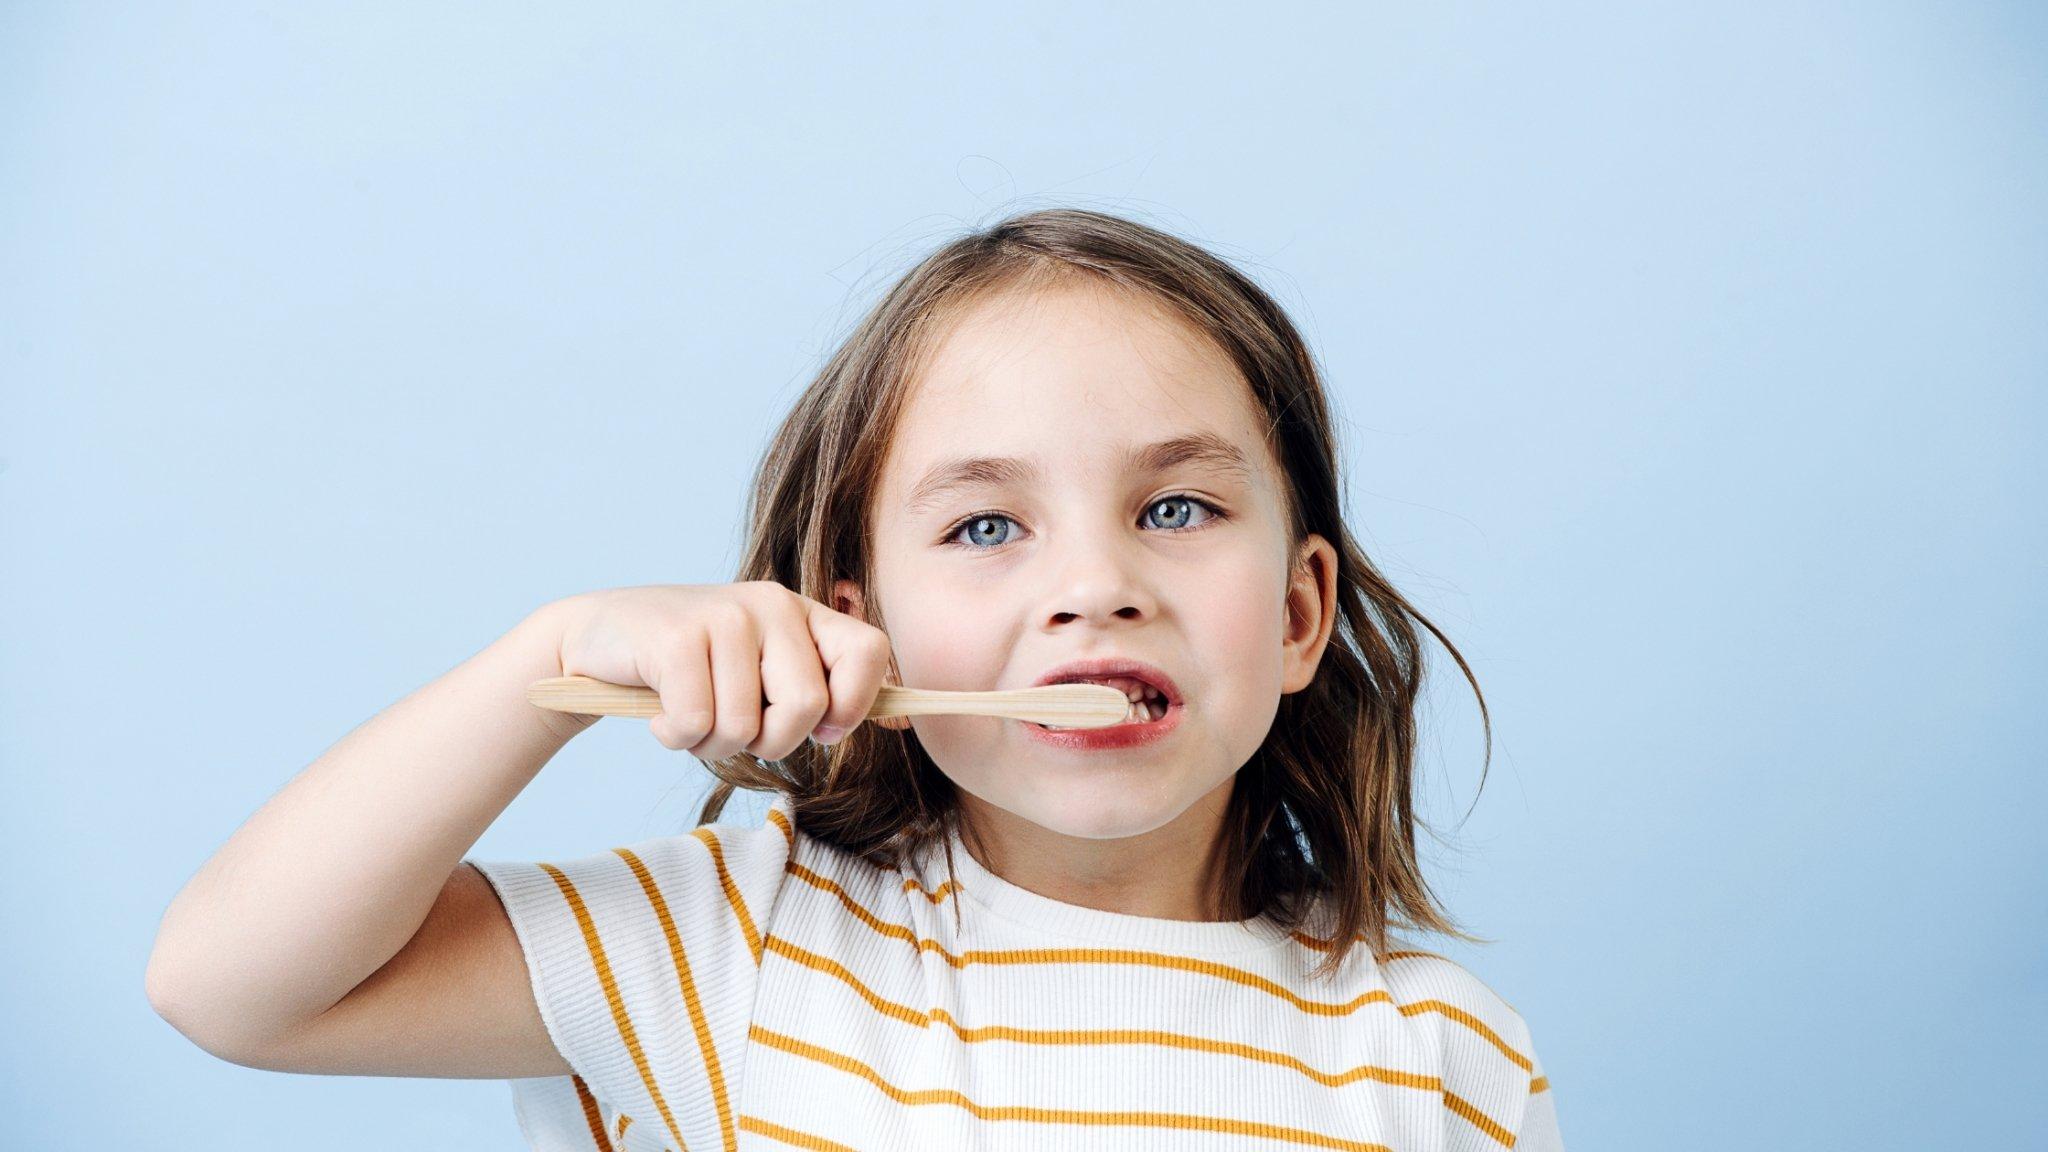 How to brush kids teeth - 5 Top Tips